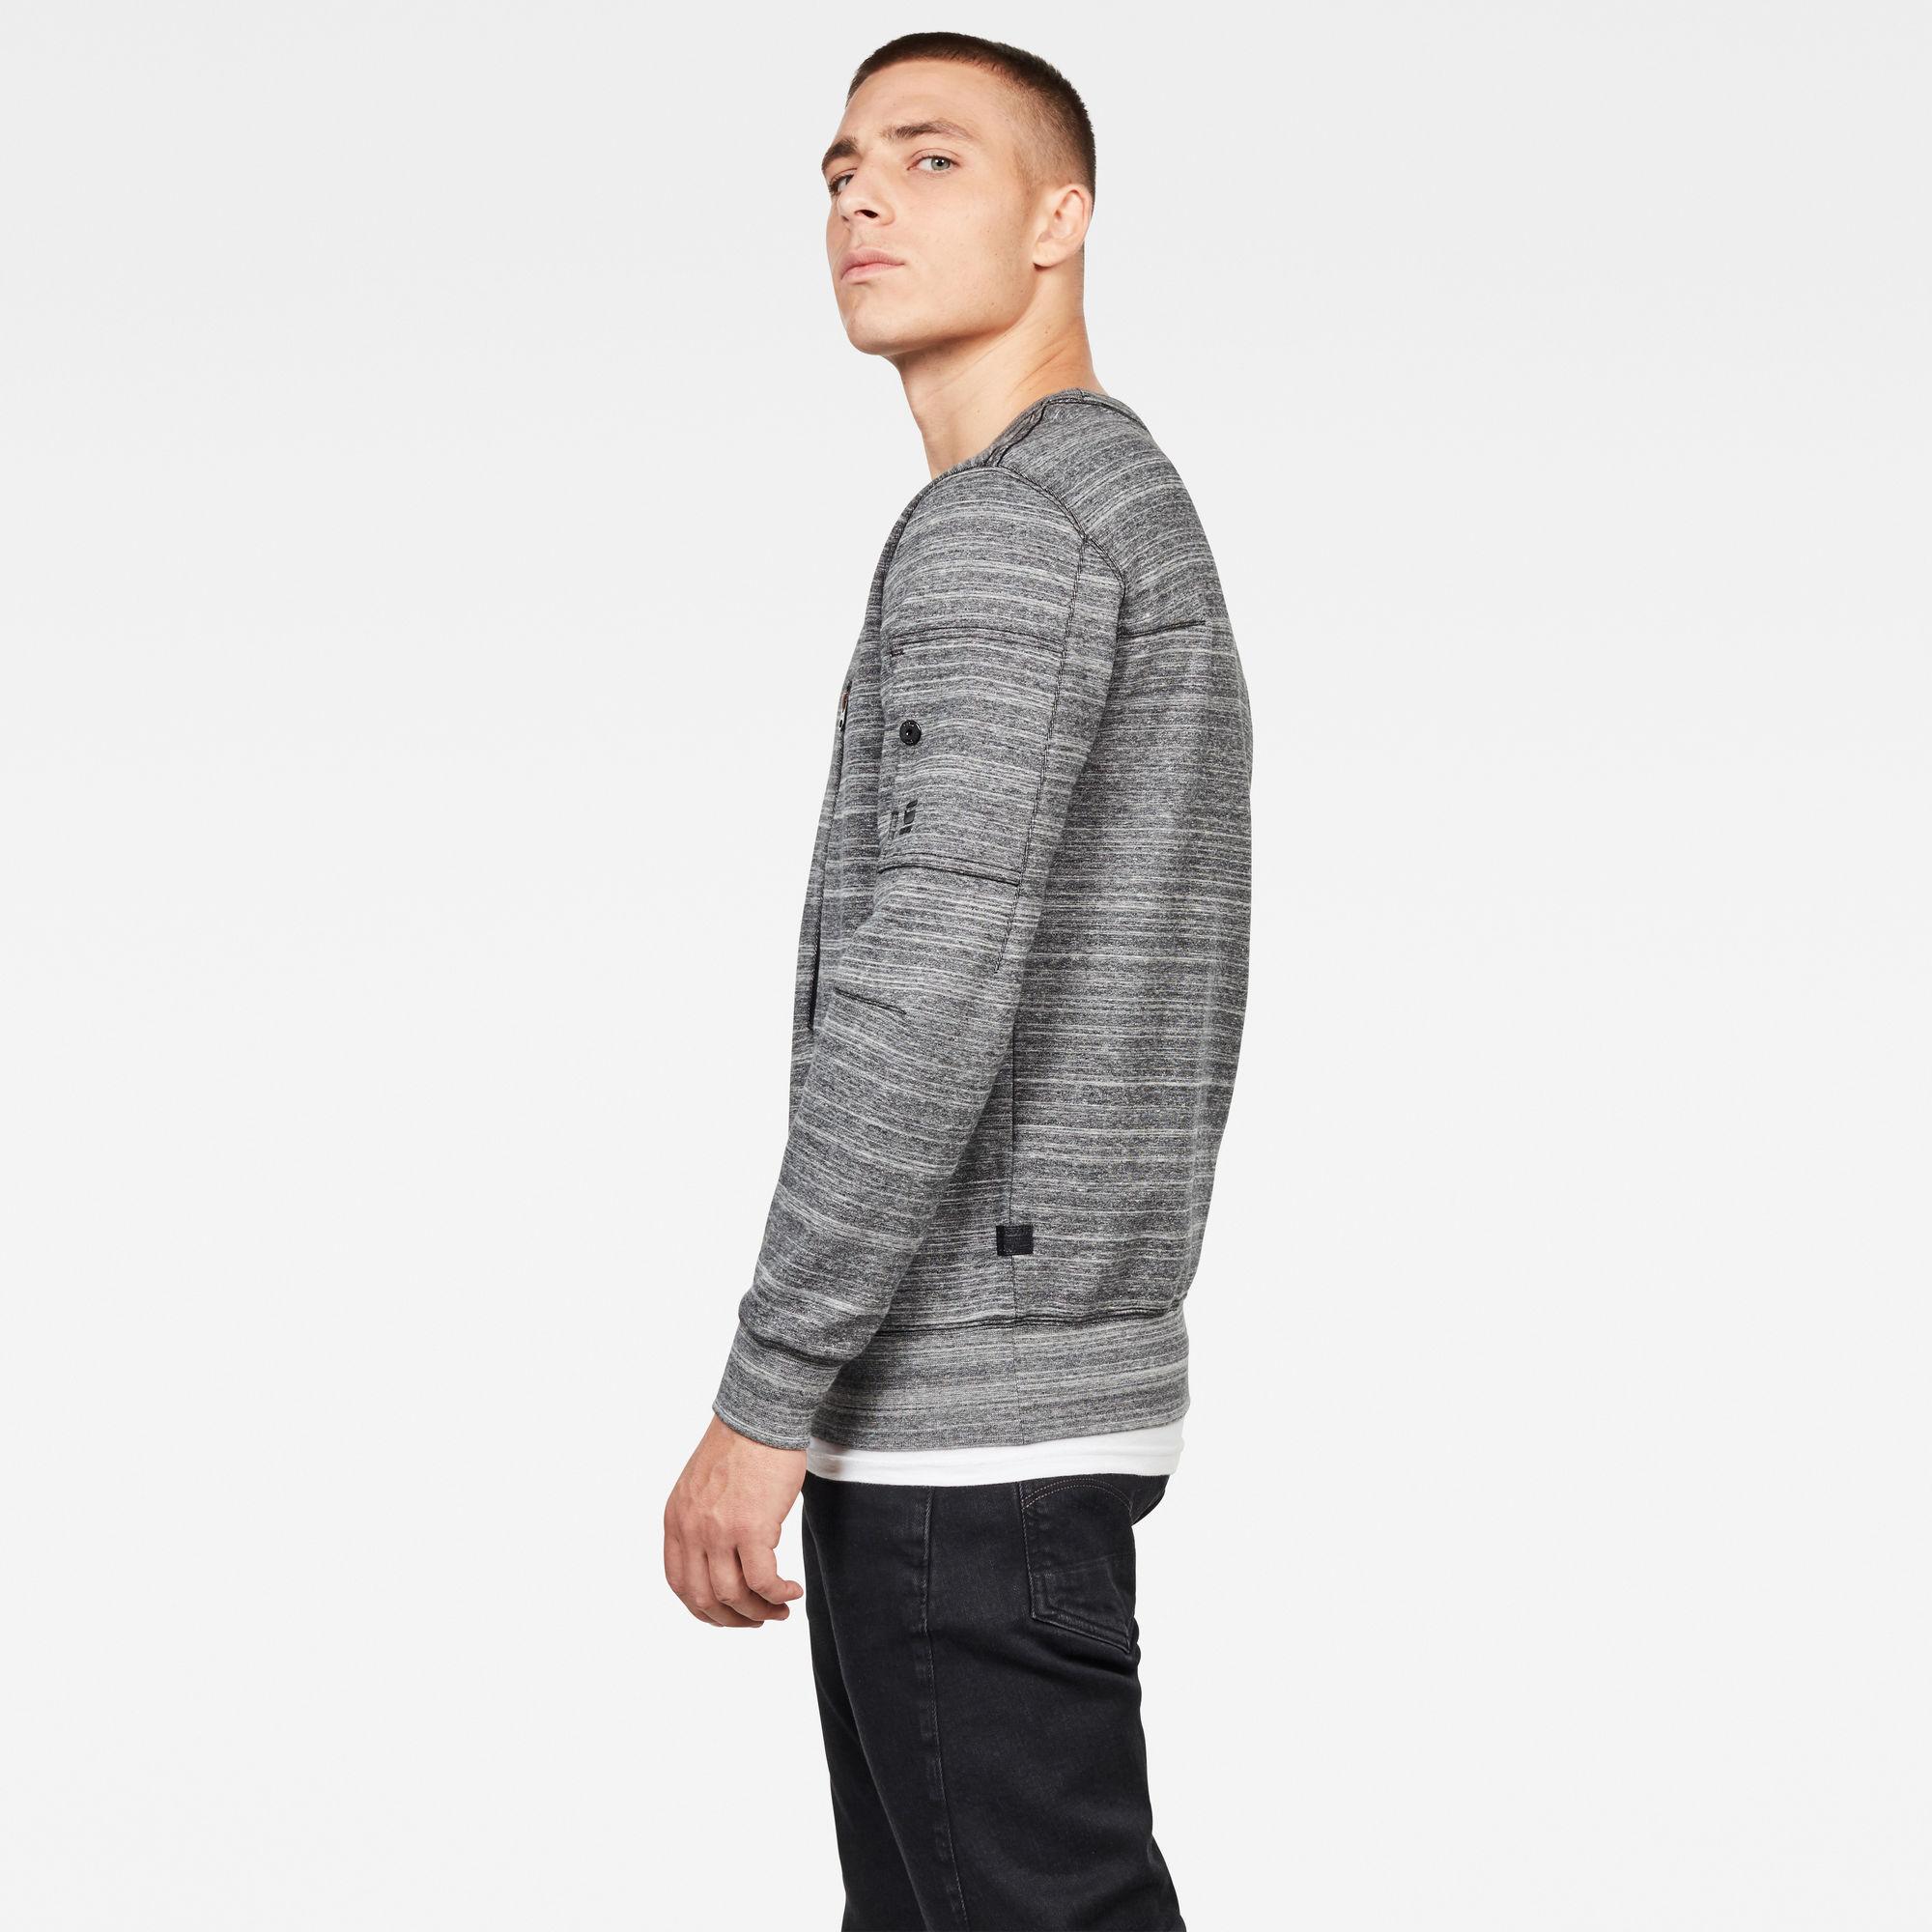 Citishield Sweater